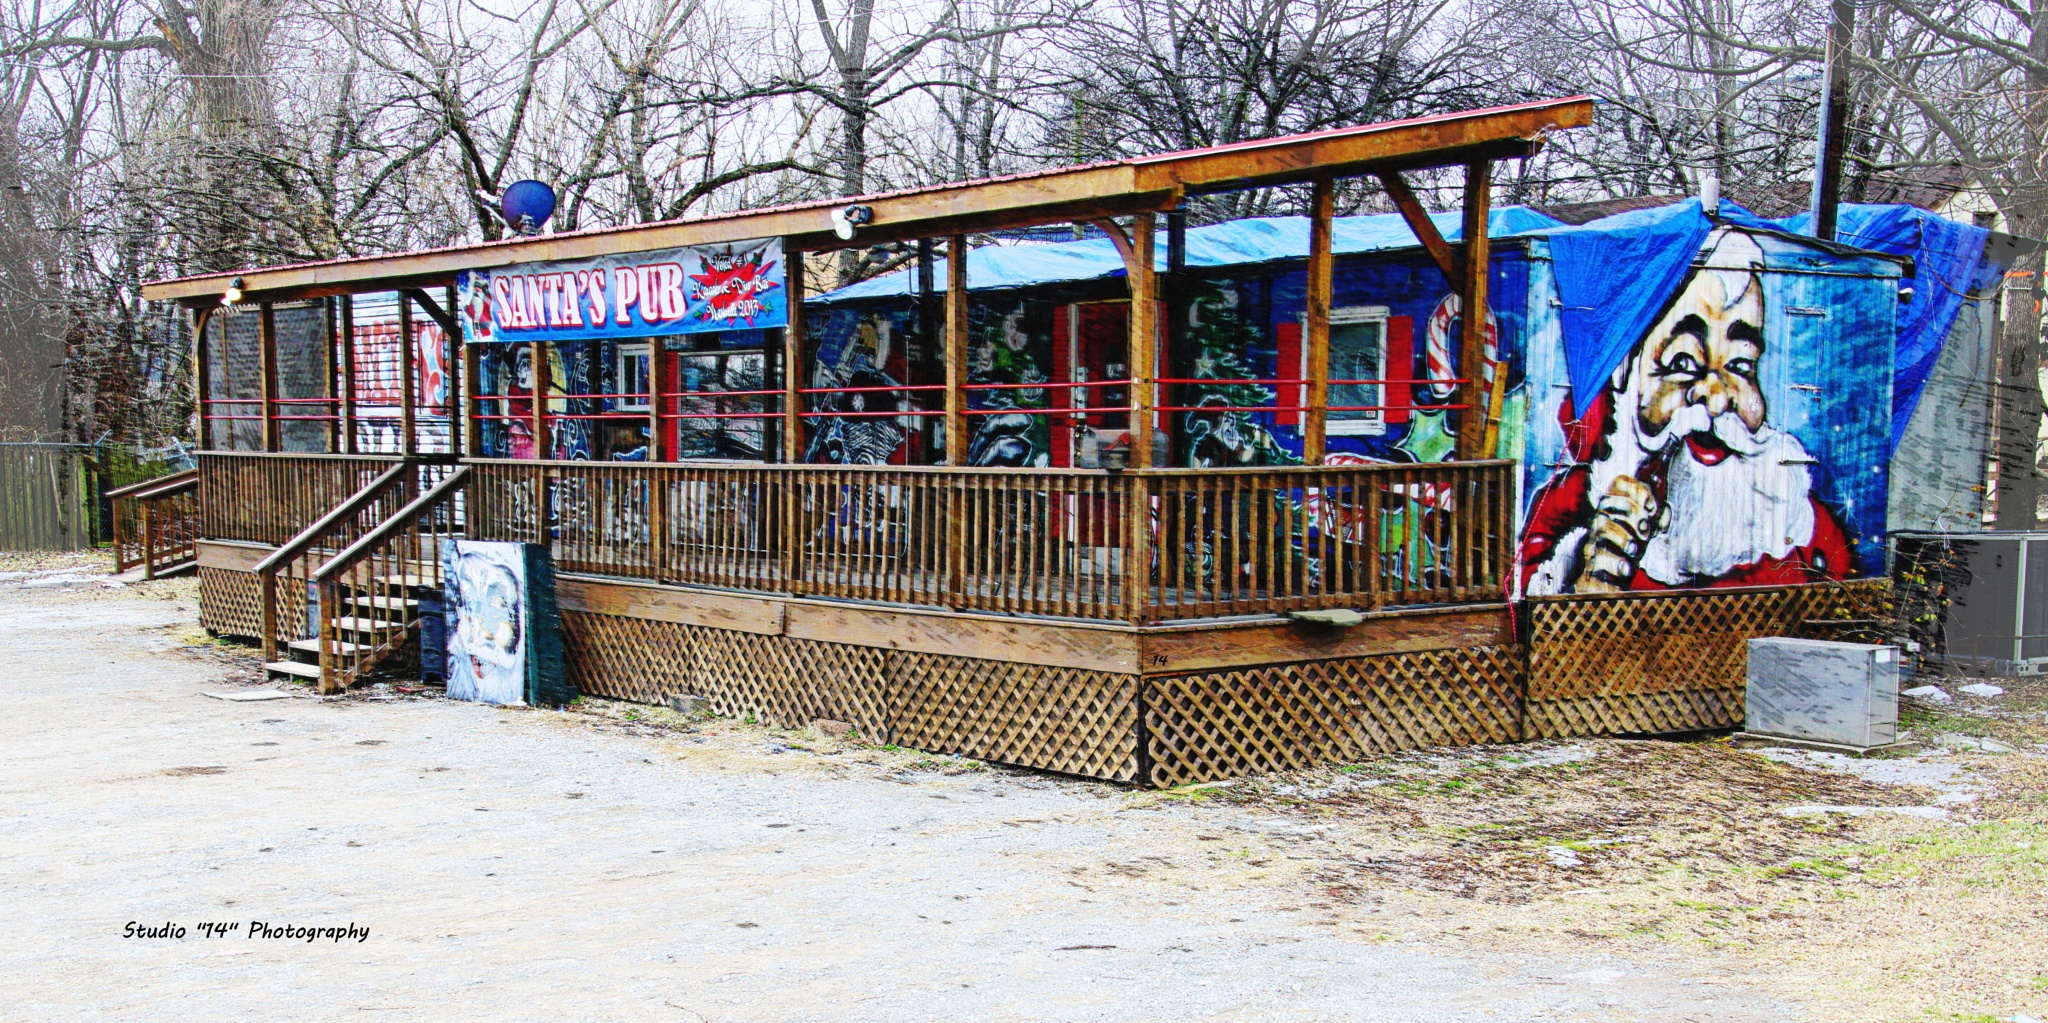 Santa's Pub by Gary Cole